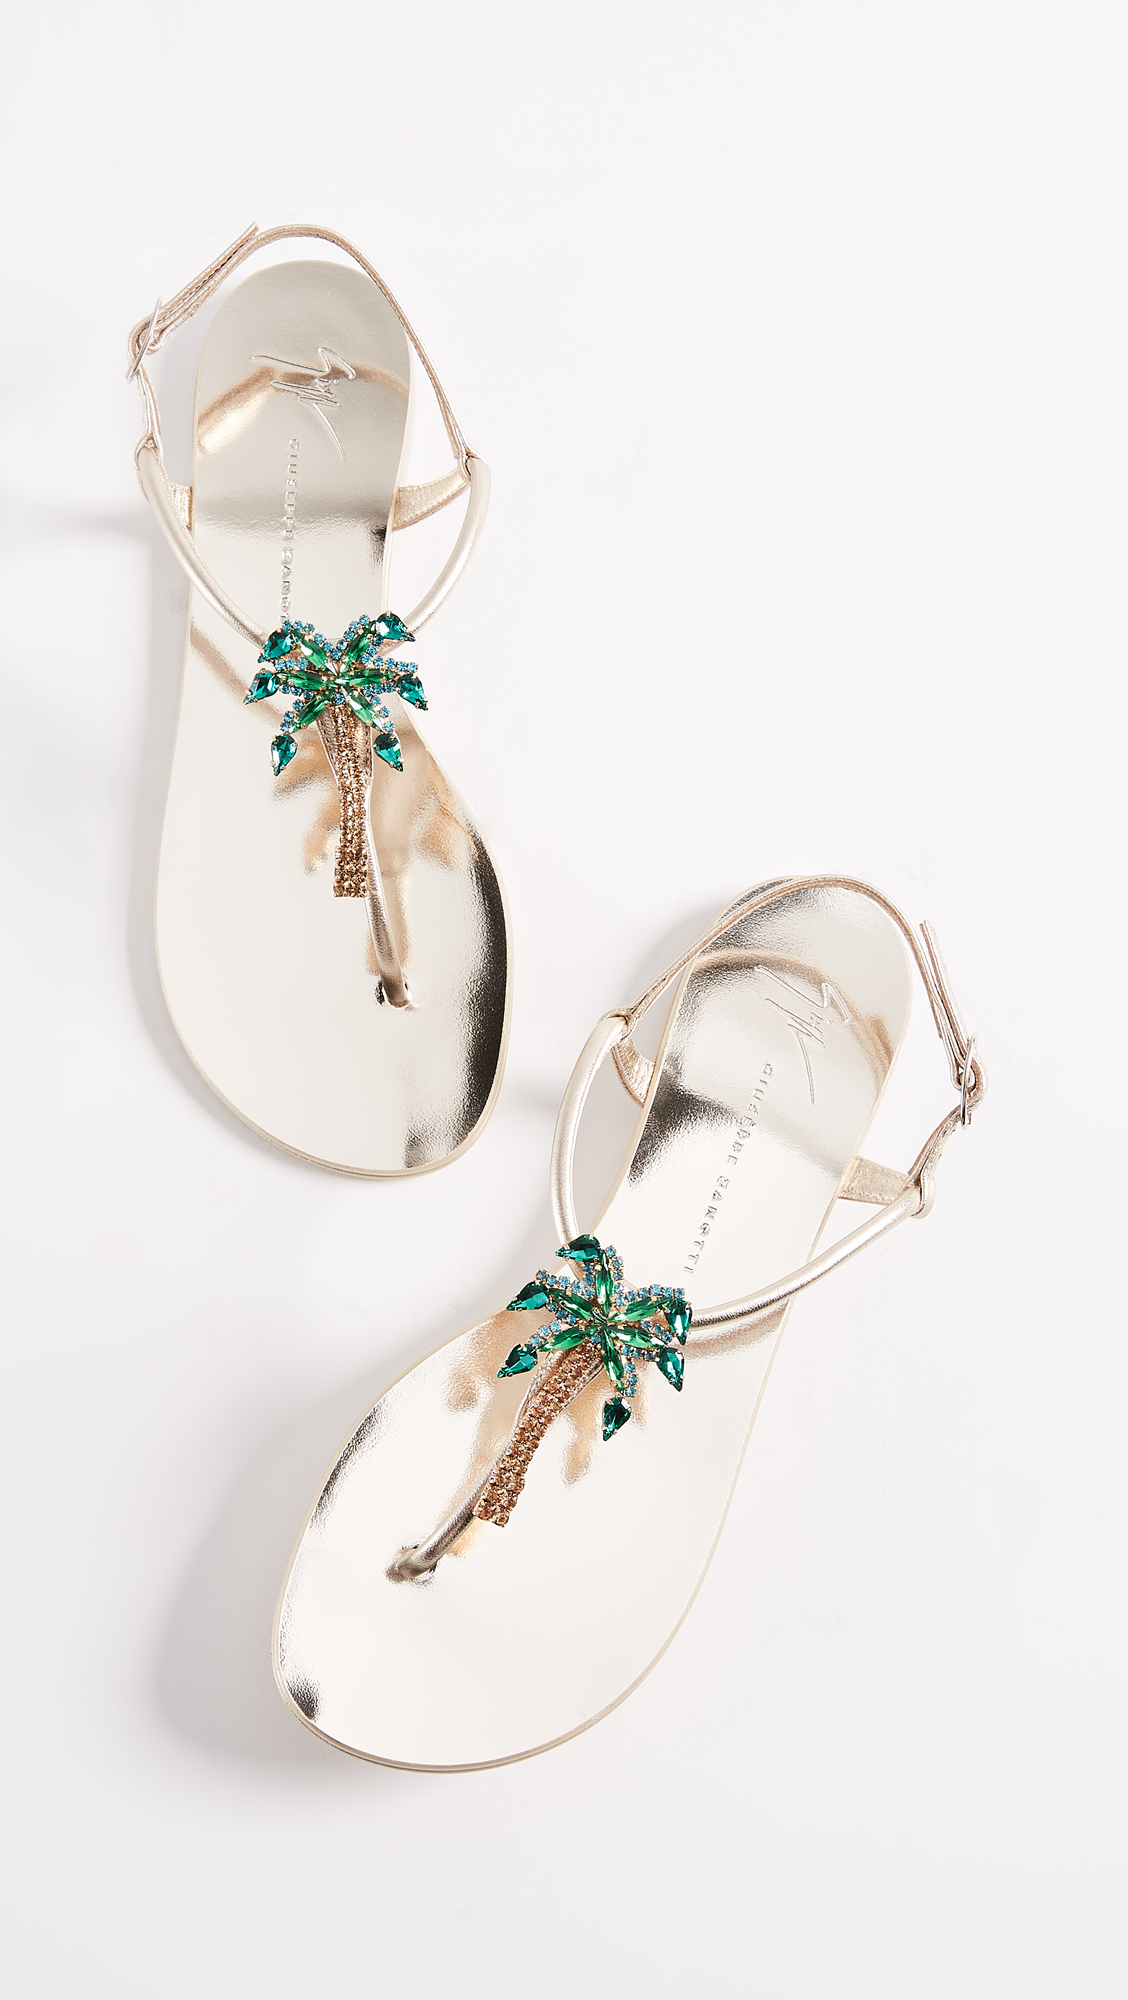 eb9d3aae9 Giuseppe Zanotti Flat Palm Tree Sandals